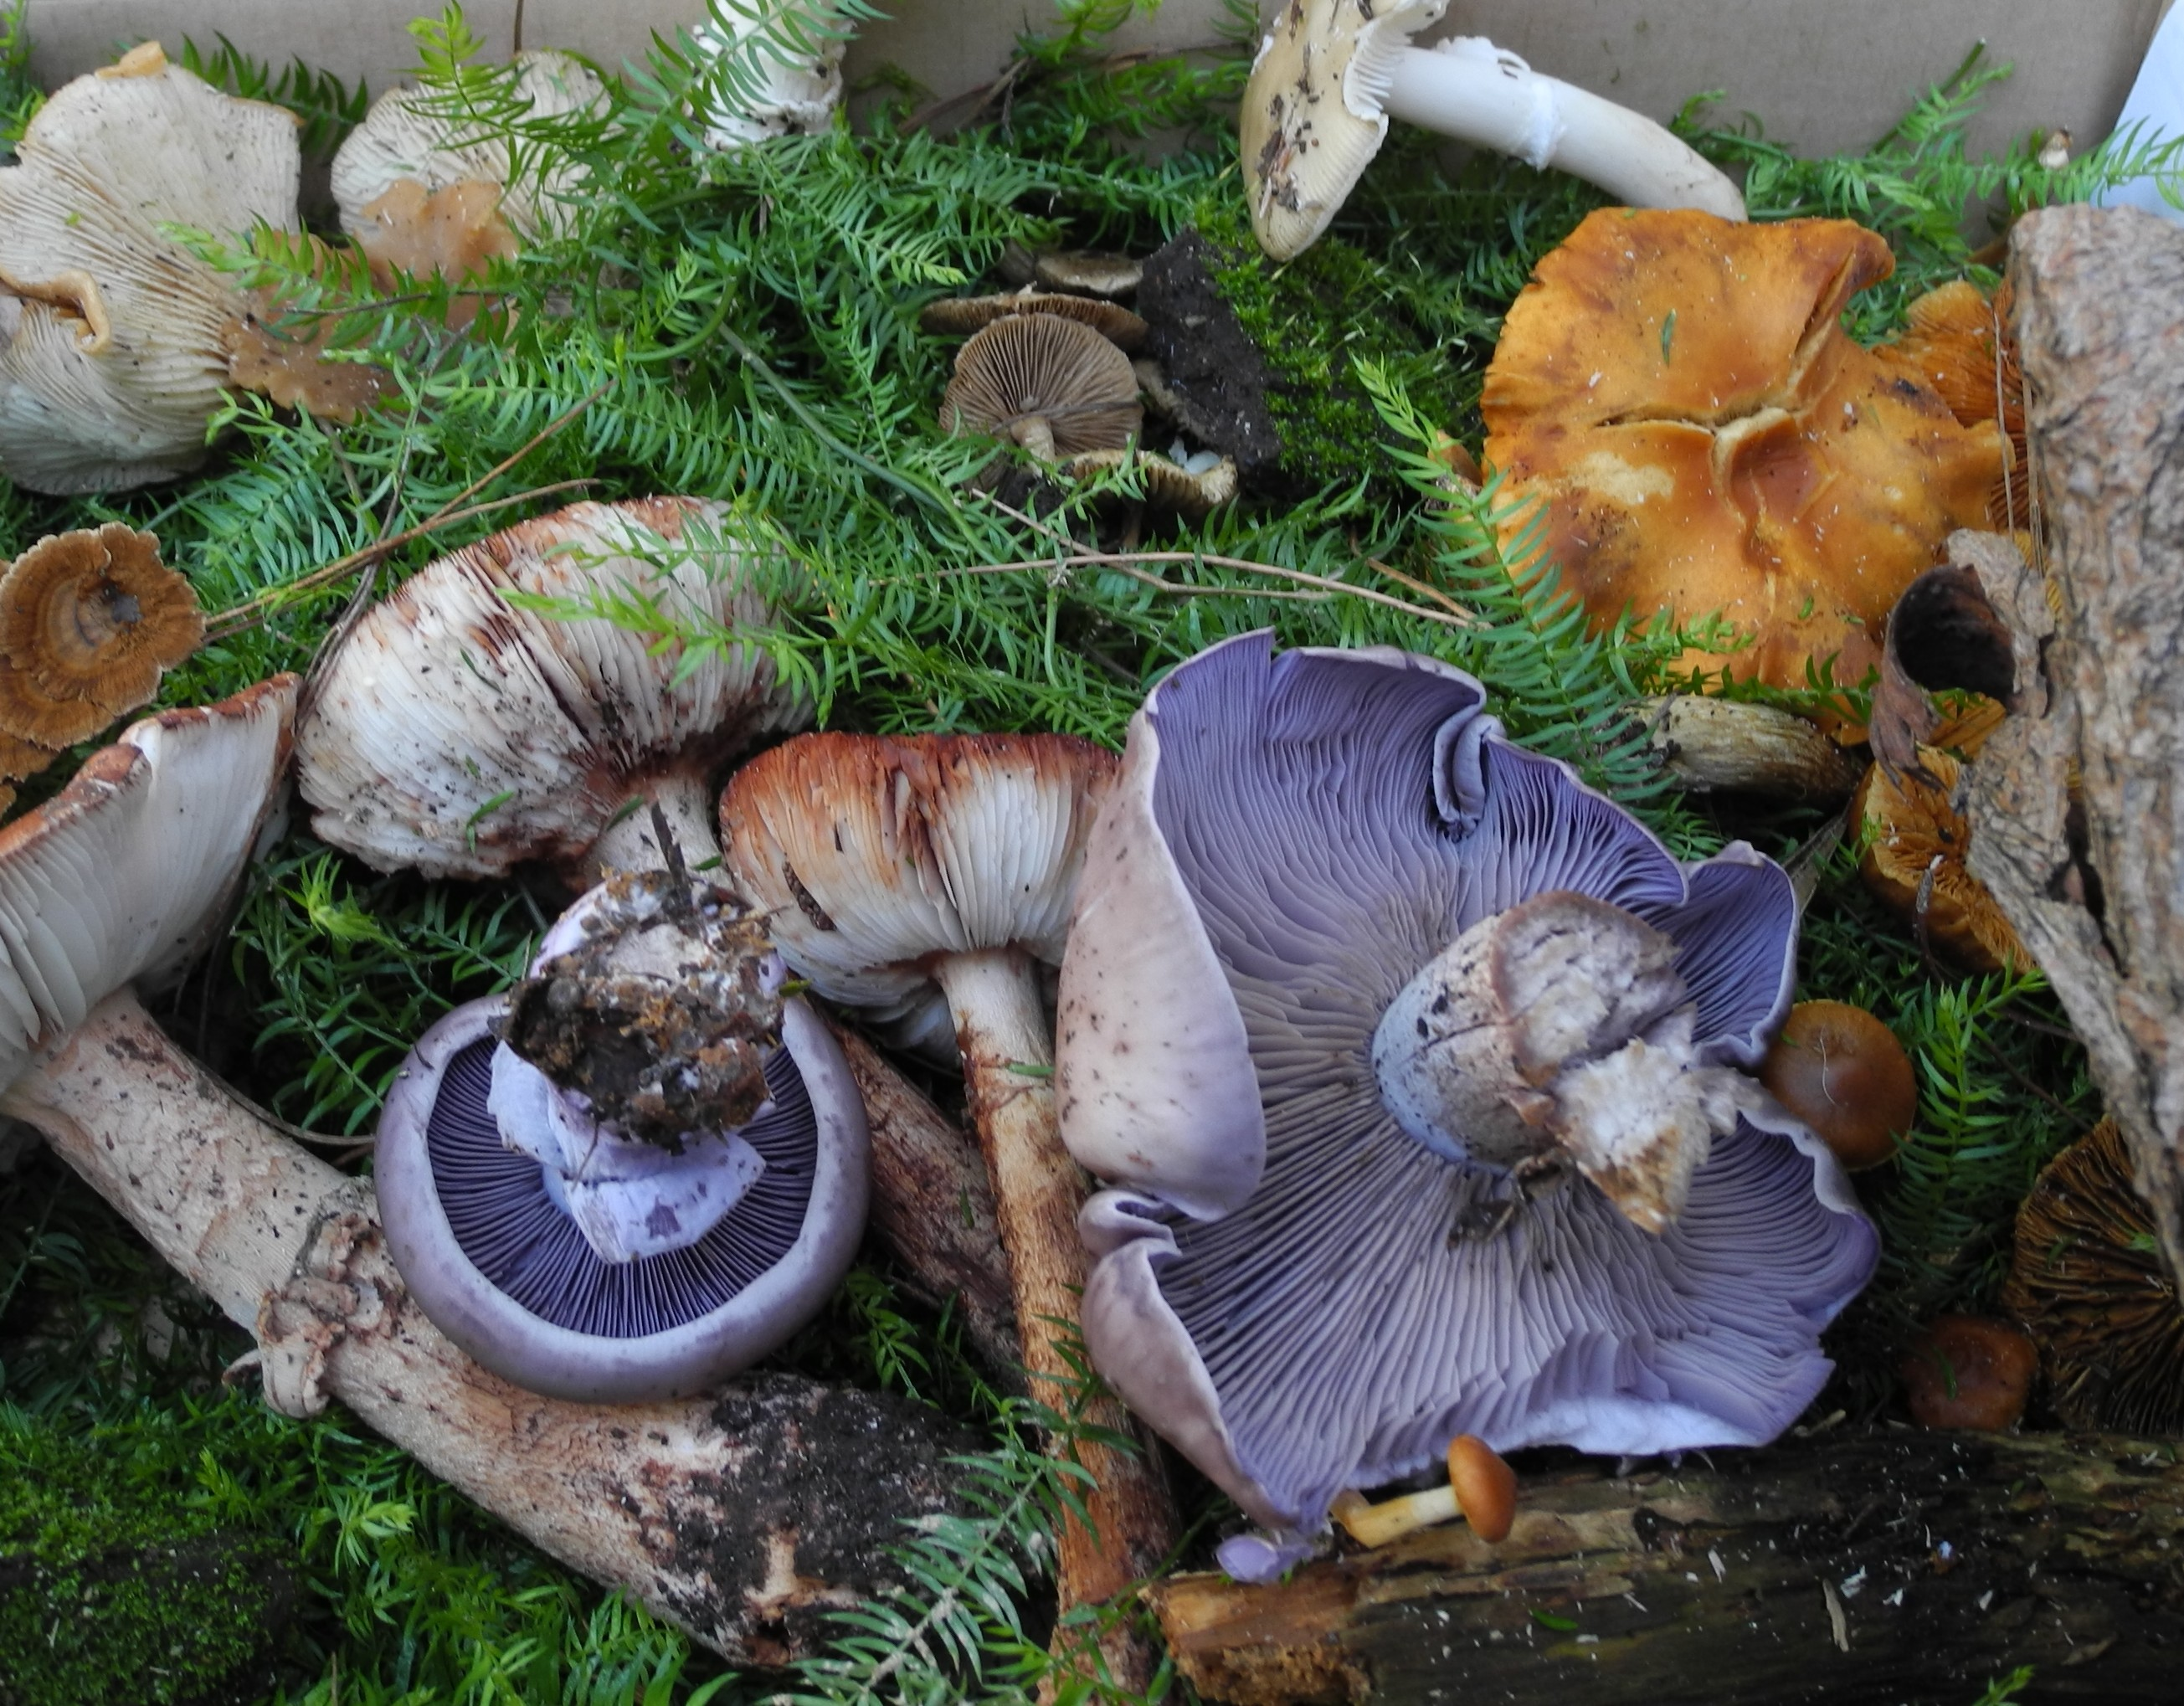 Mixed-wild-mushrooms